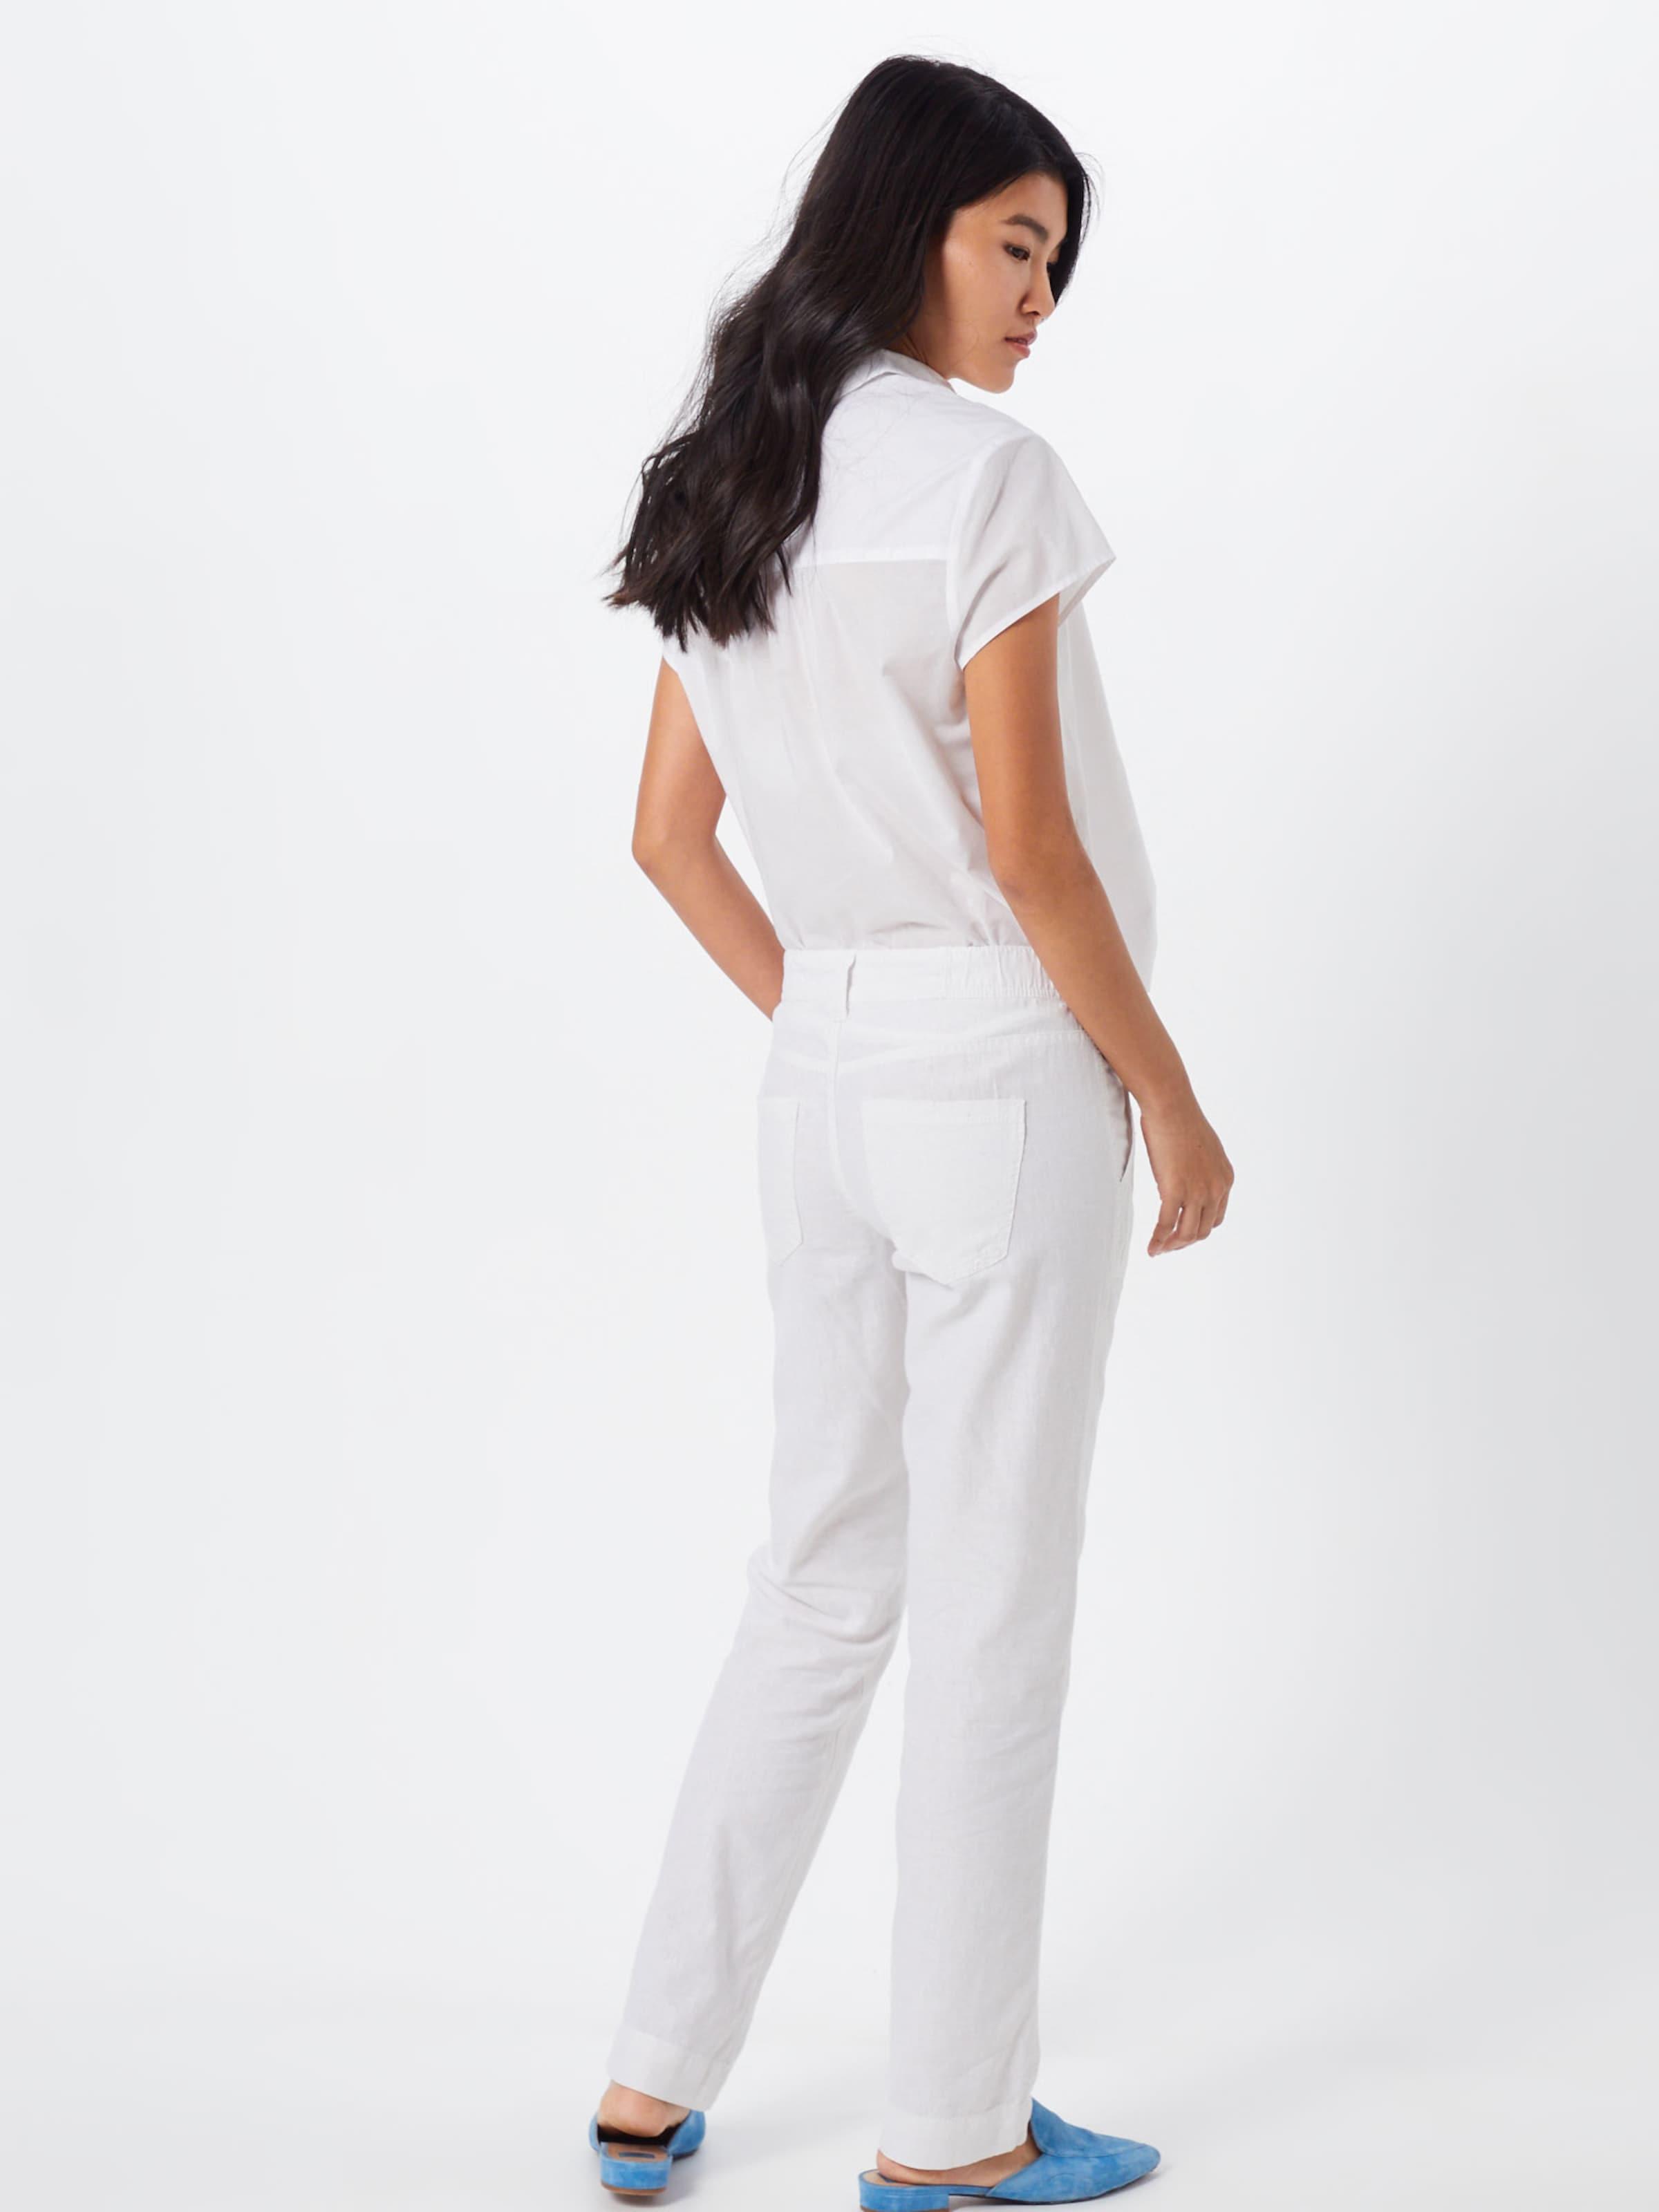 'abby' Blanc By Designed En Q s Pantalon OXTwuPkZi